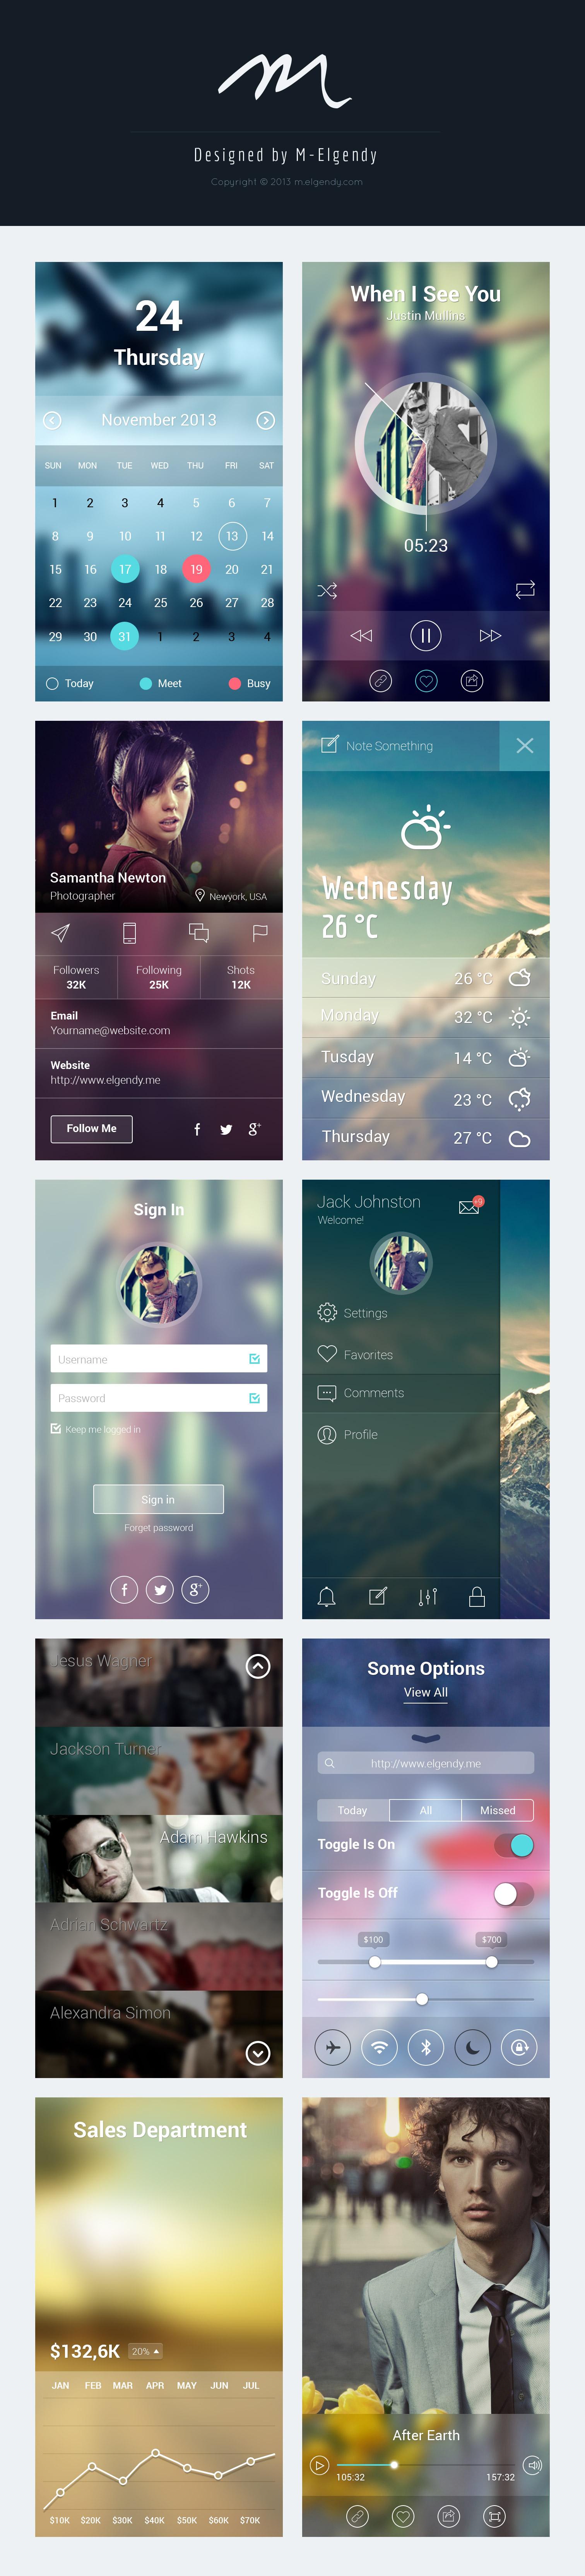 iOS-7-App-Screens-full.jpg 1.512×6.658 piksel